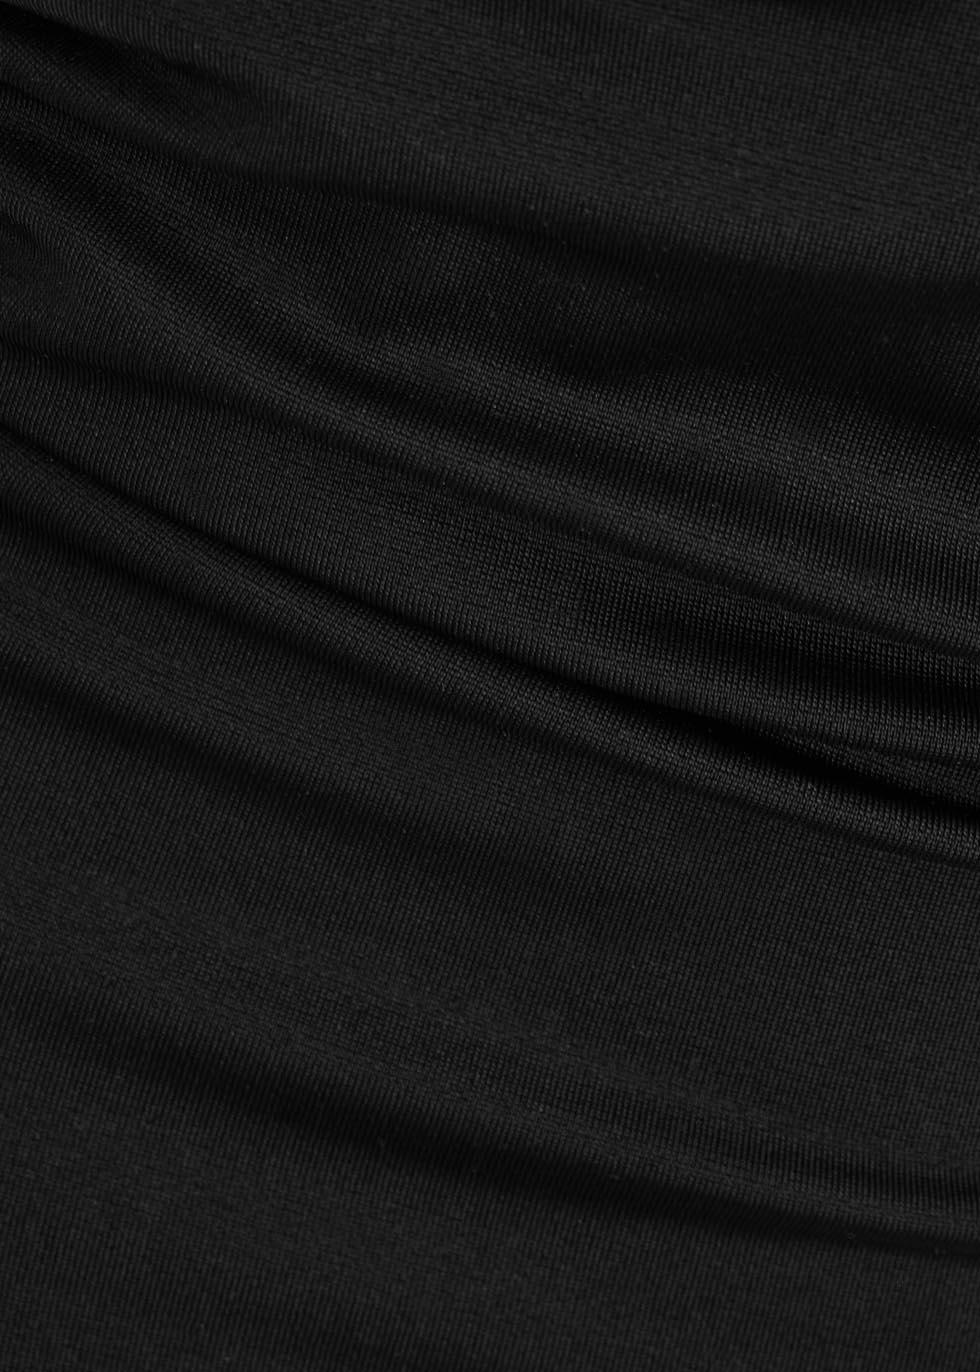 Mat De Luxe black forming bodysuit - Wolford